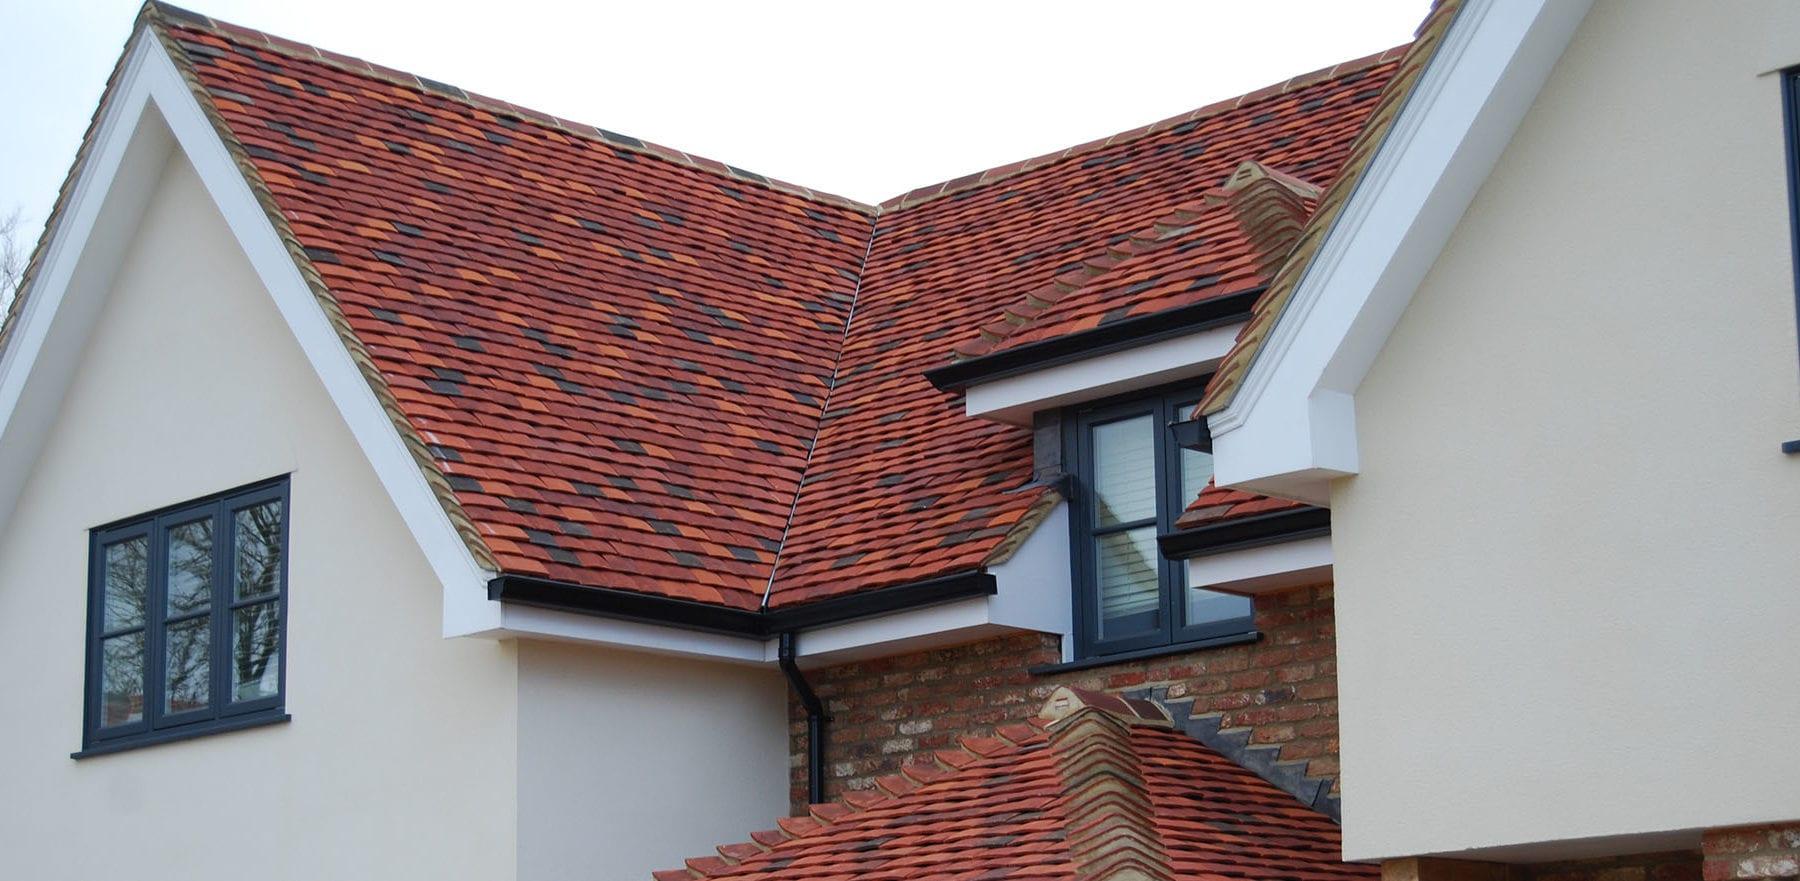 Lifestiles - Handmade Multi Clay Roof Tiles - Nazing, England 4